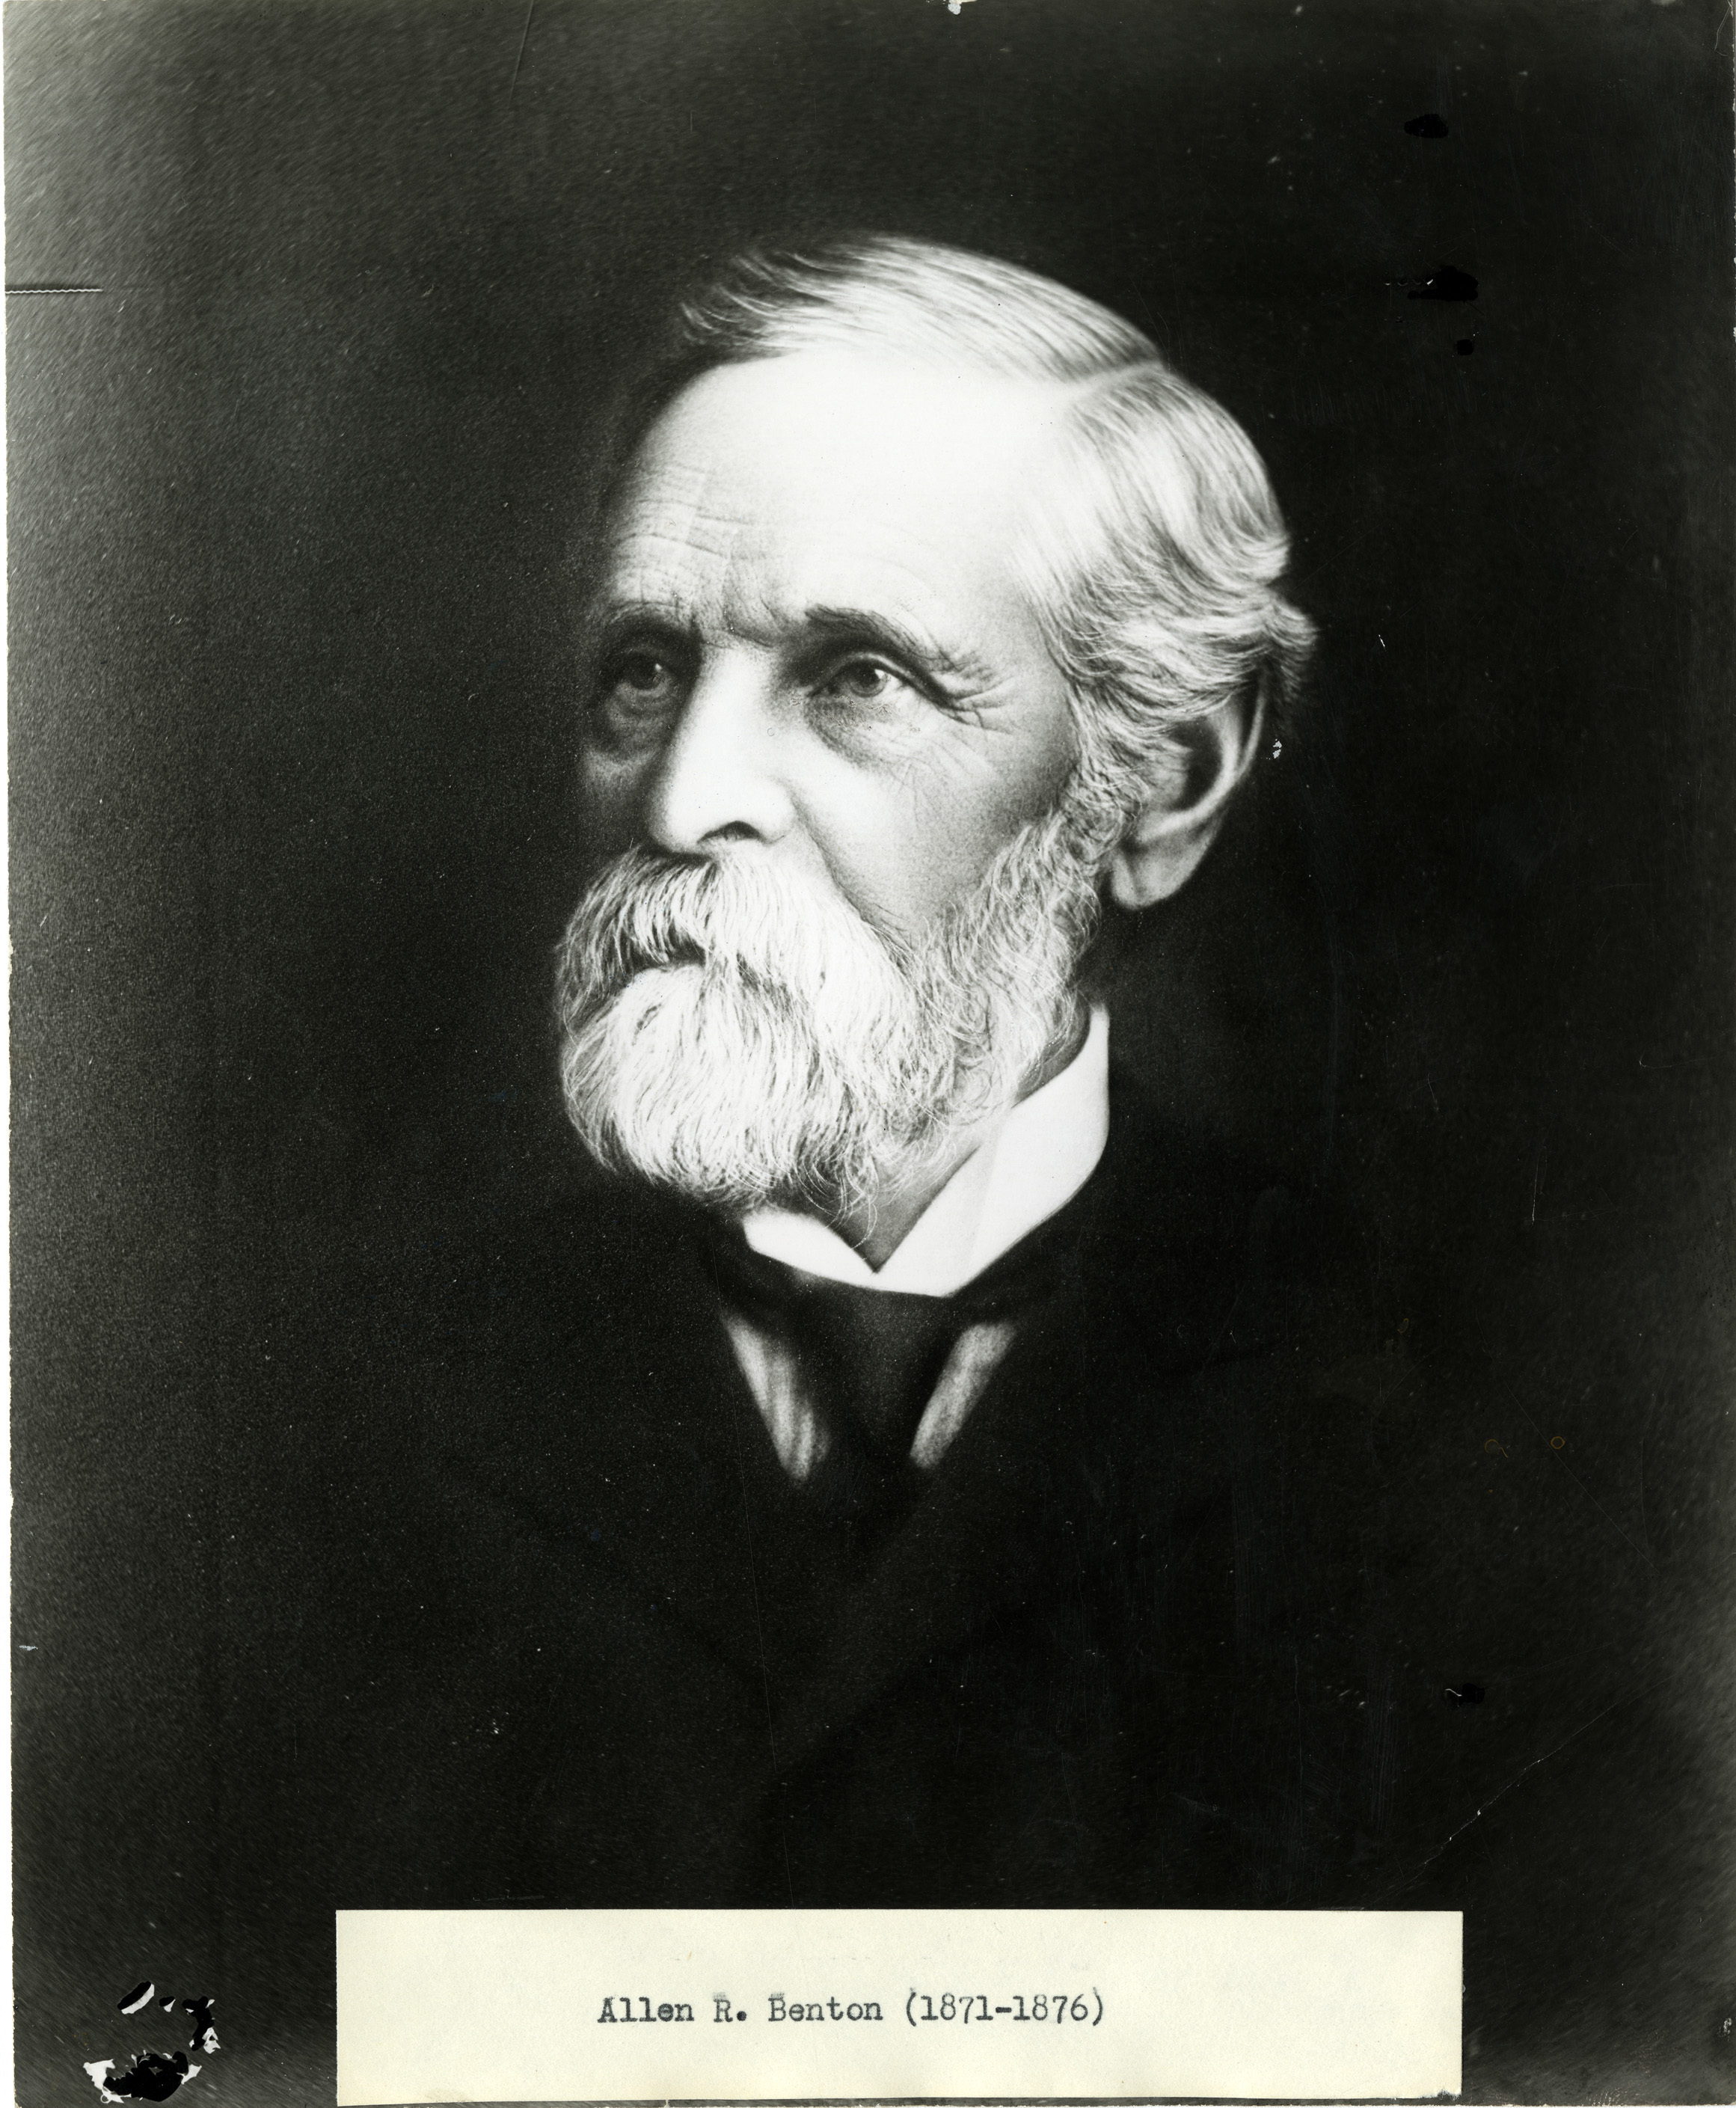 Allen R. Benton portrait